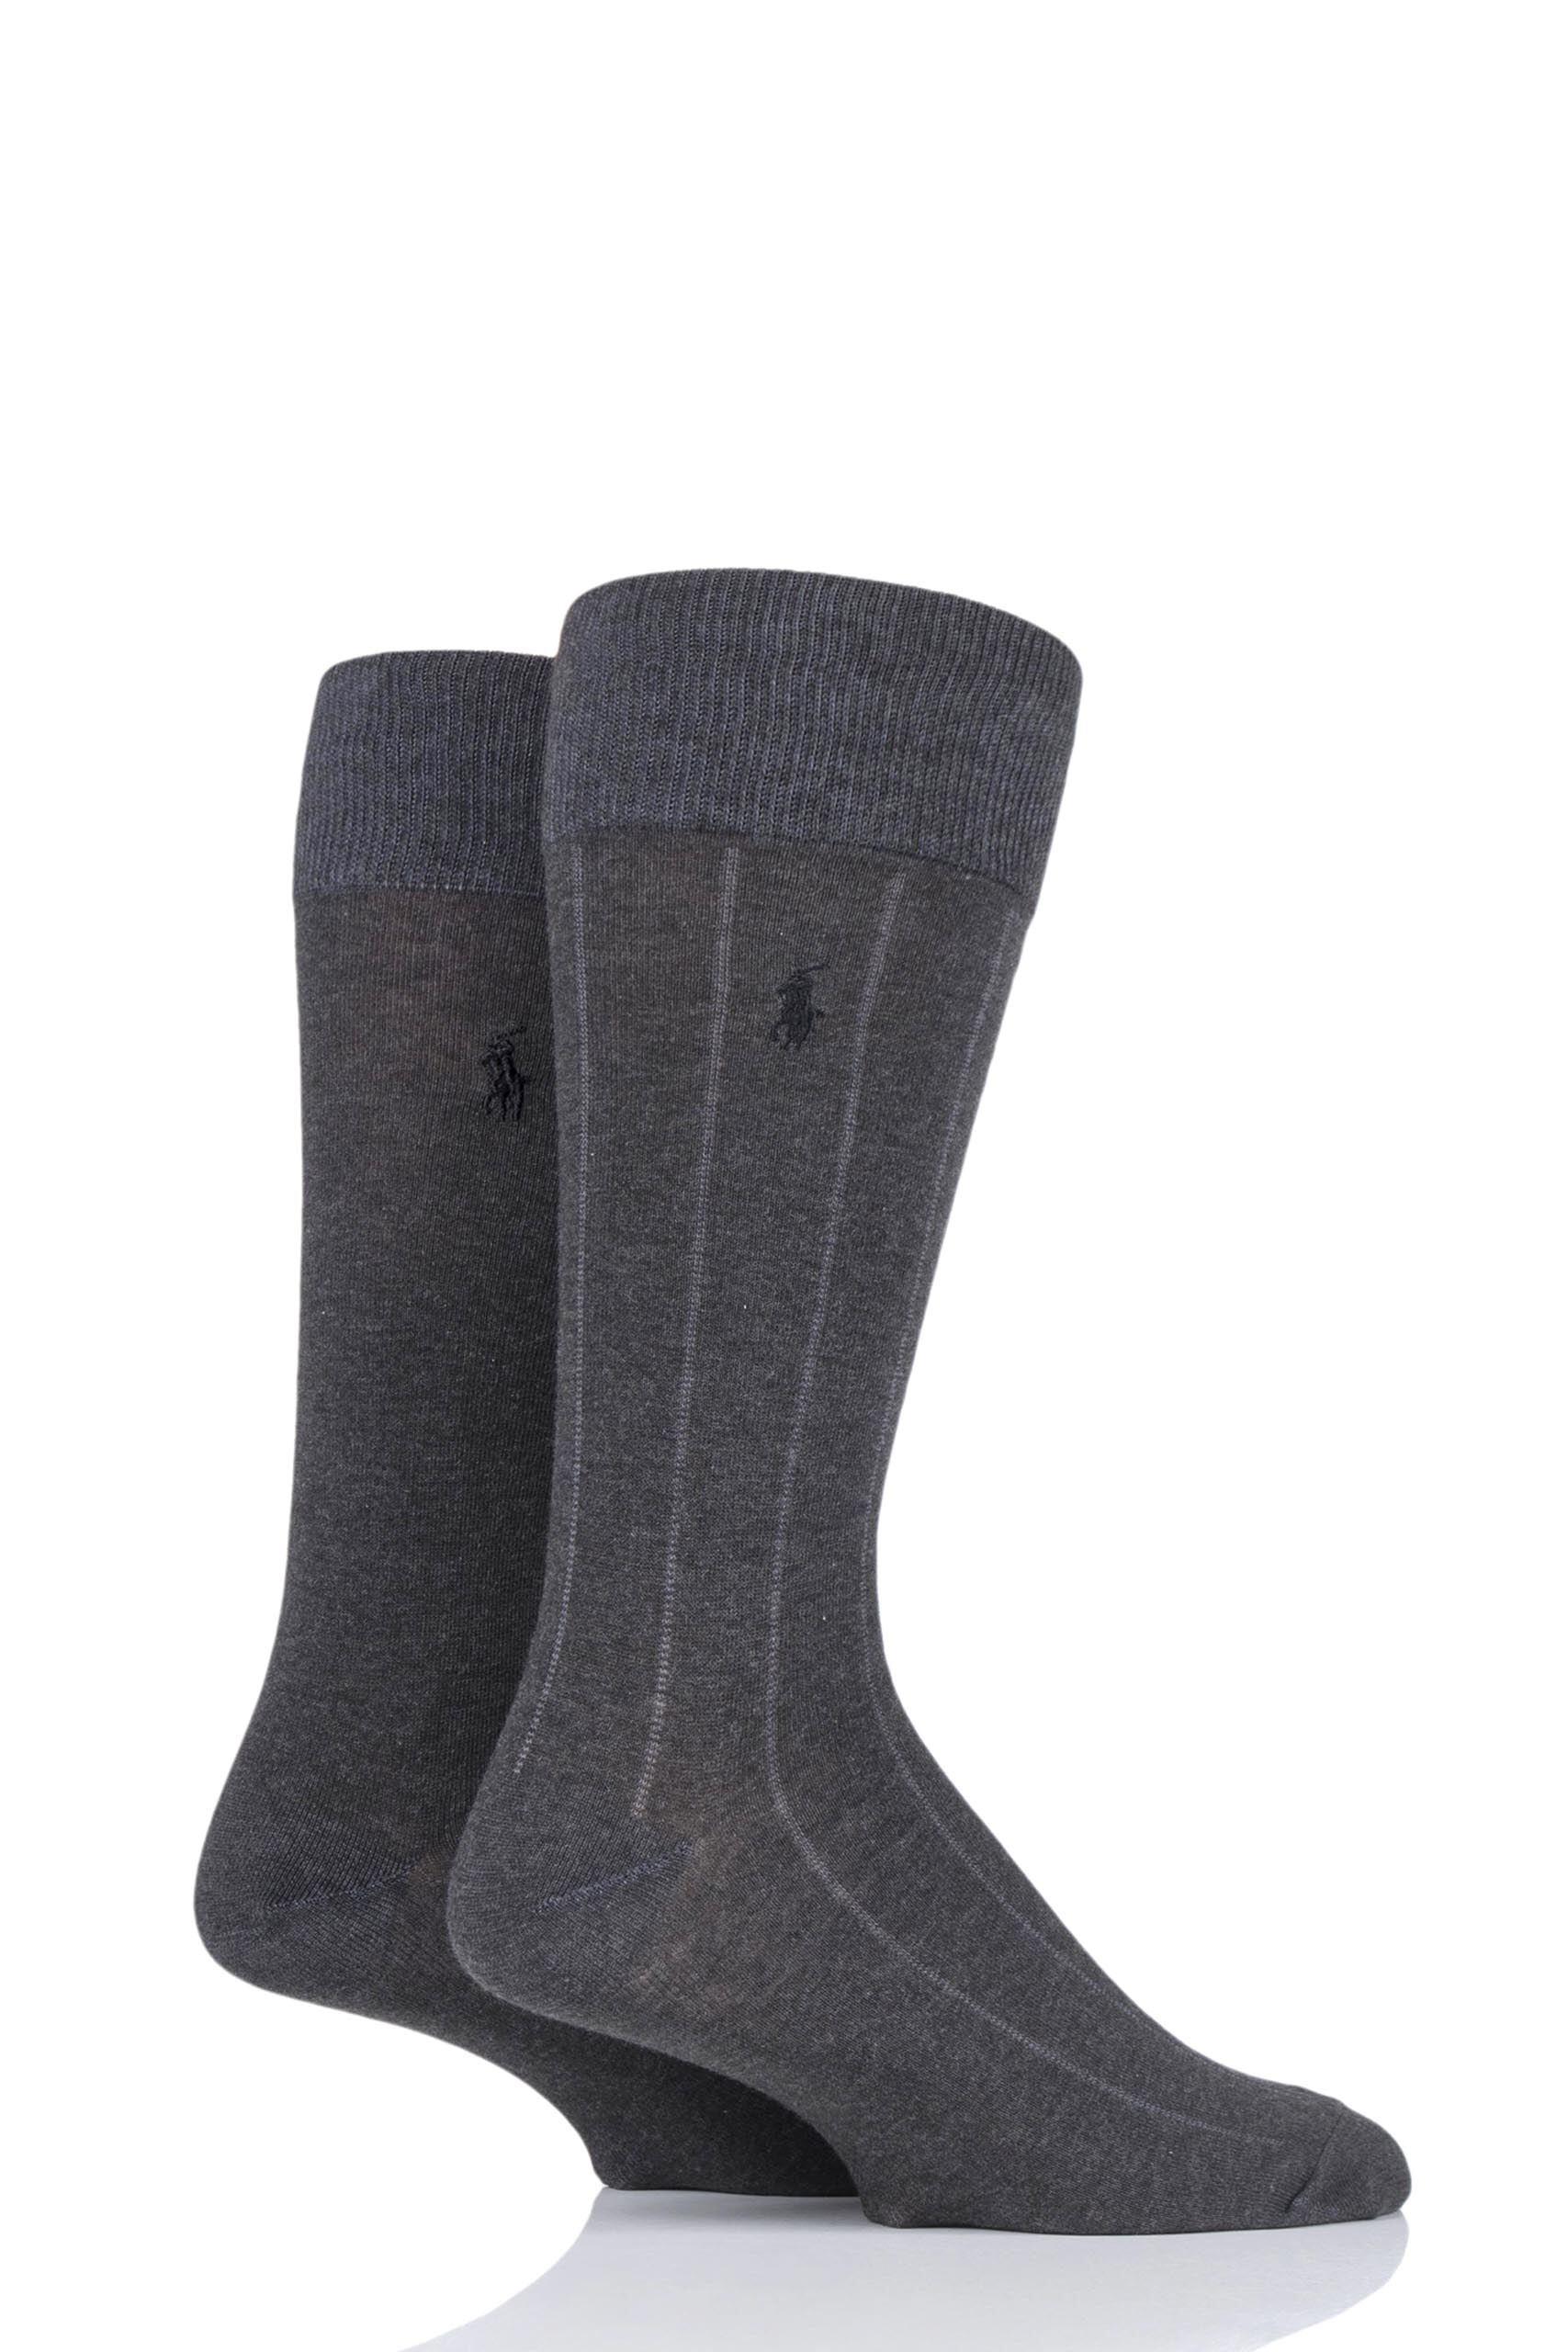 Image of 2 Pair Charcoal Cotton Vertical Stripe and Plain Socks Men's 6-11 Mens - Ralph Lauren